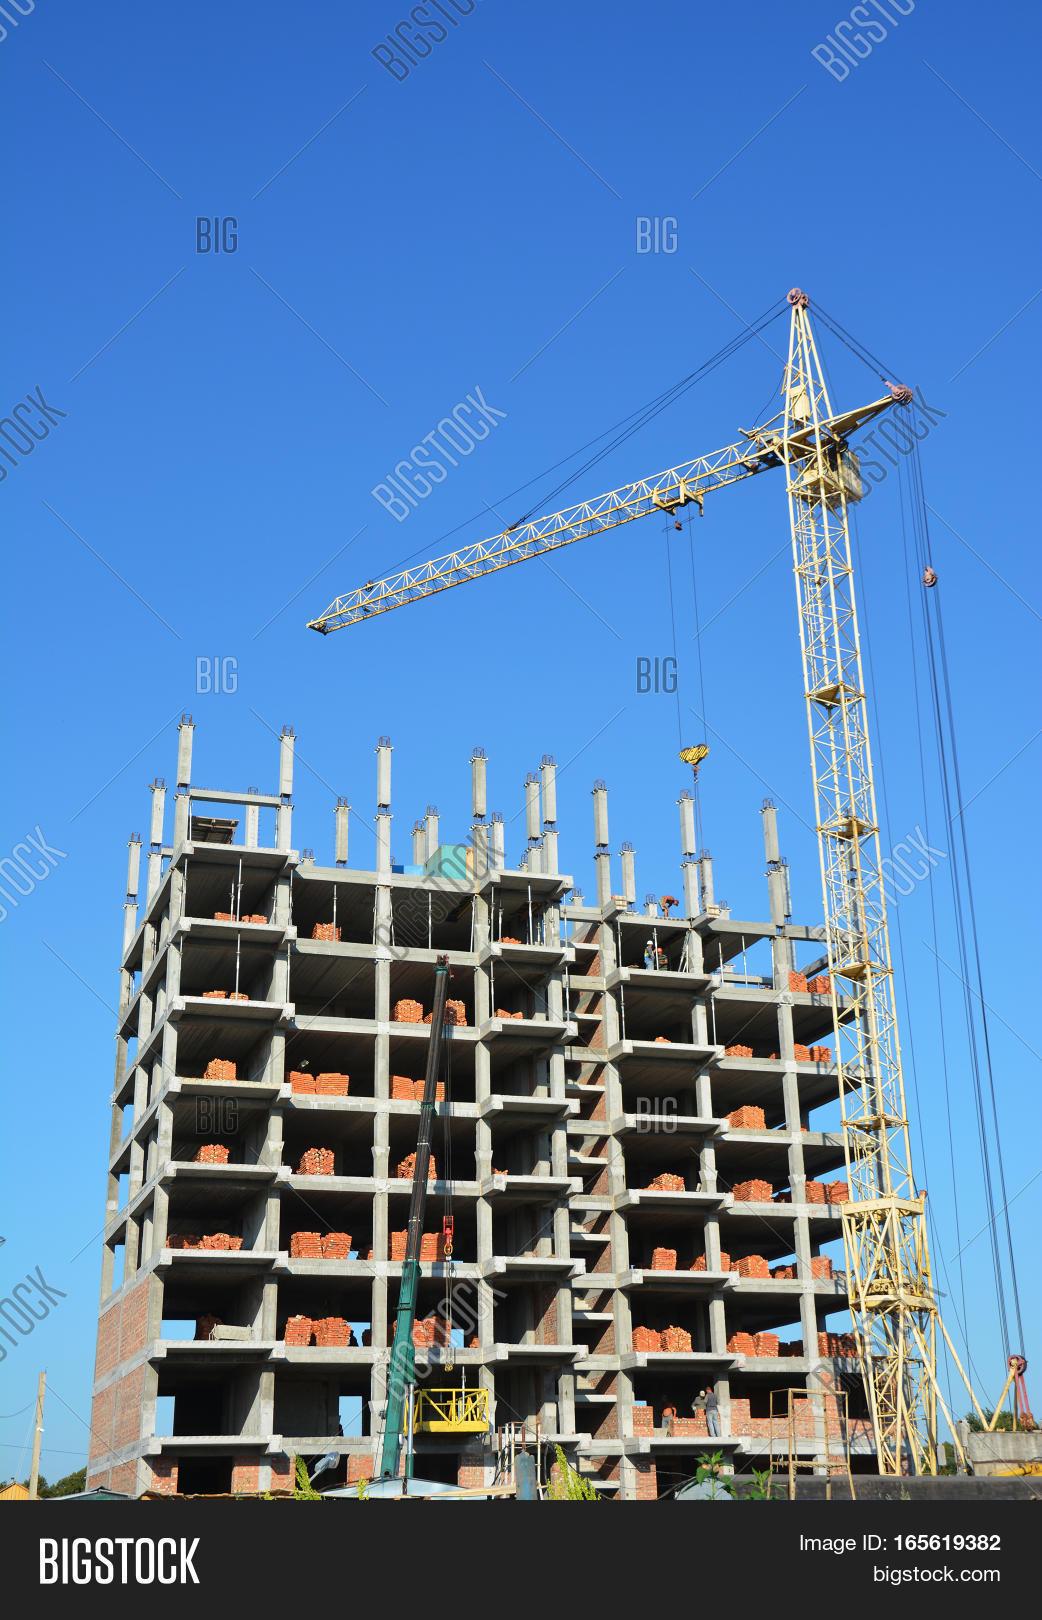 building cranes on image photo free trial bigstock